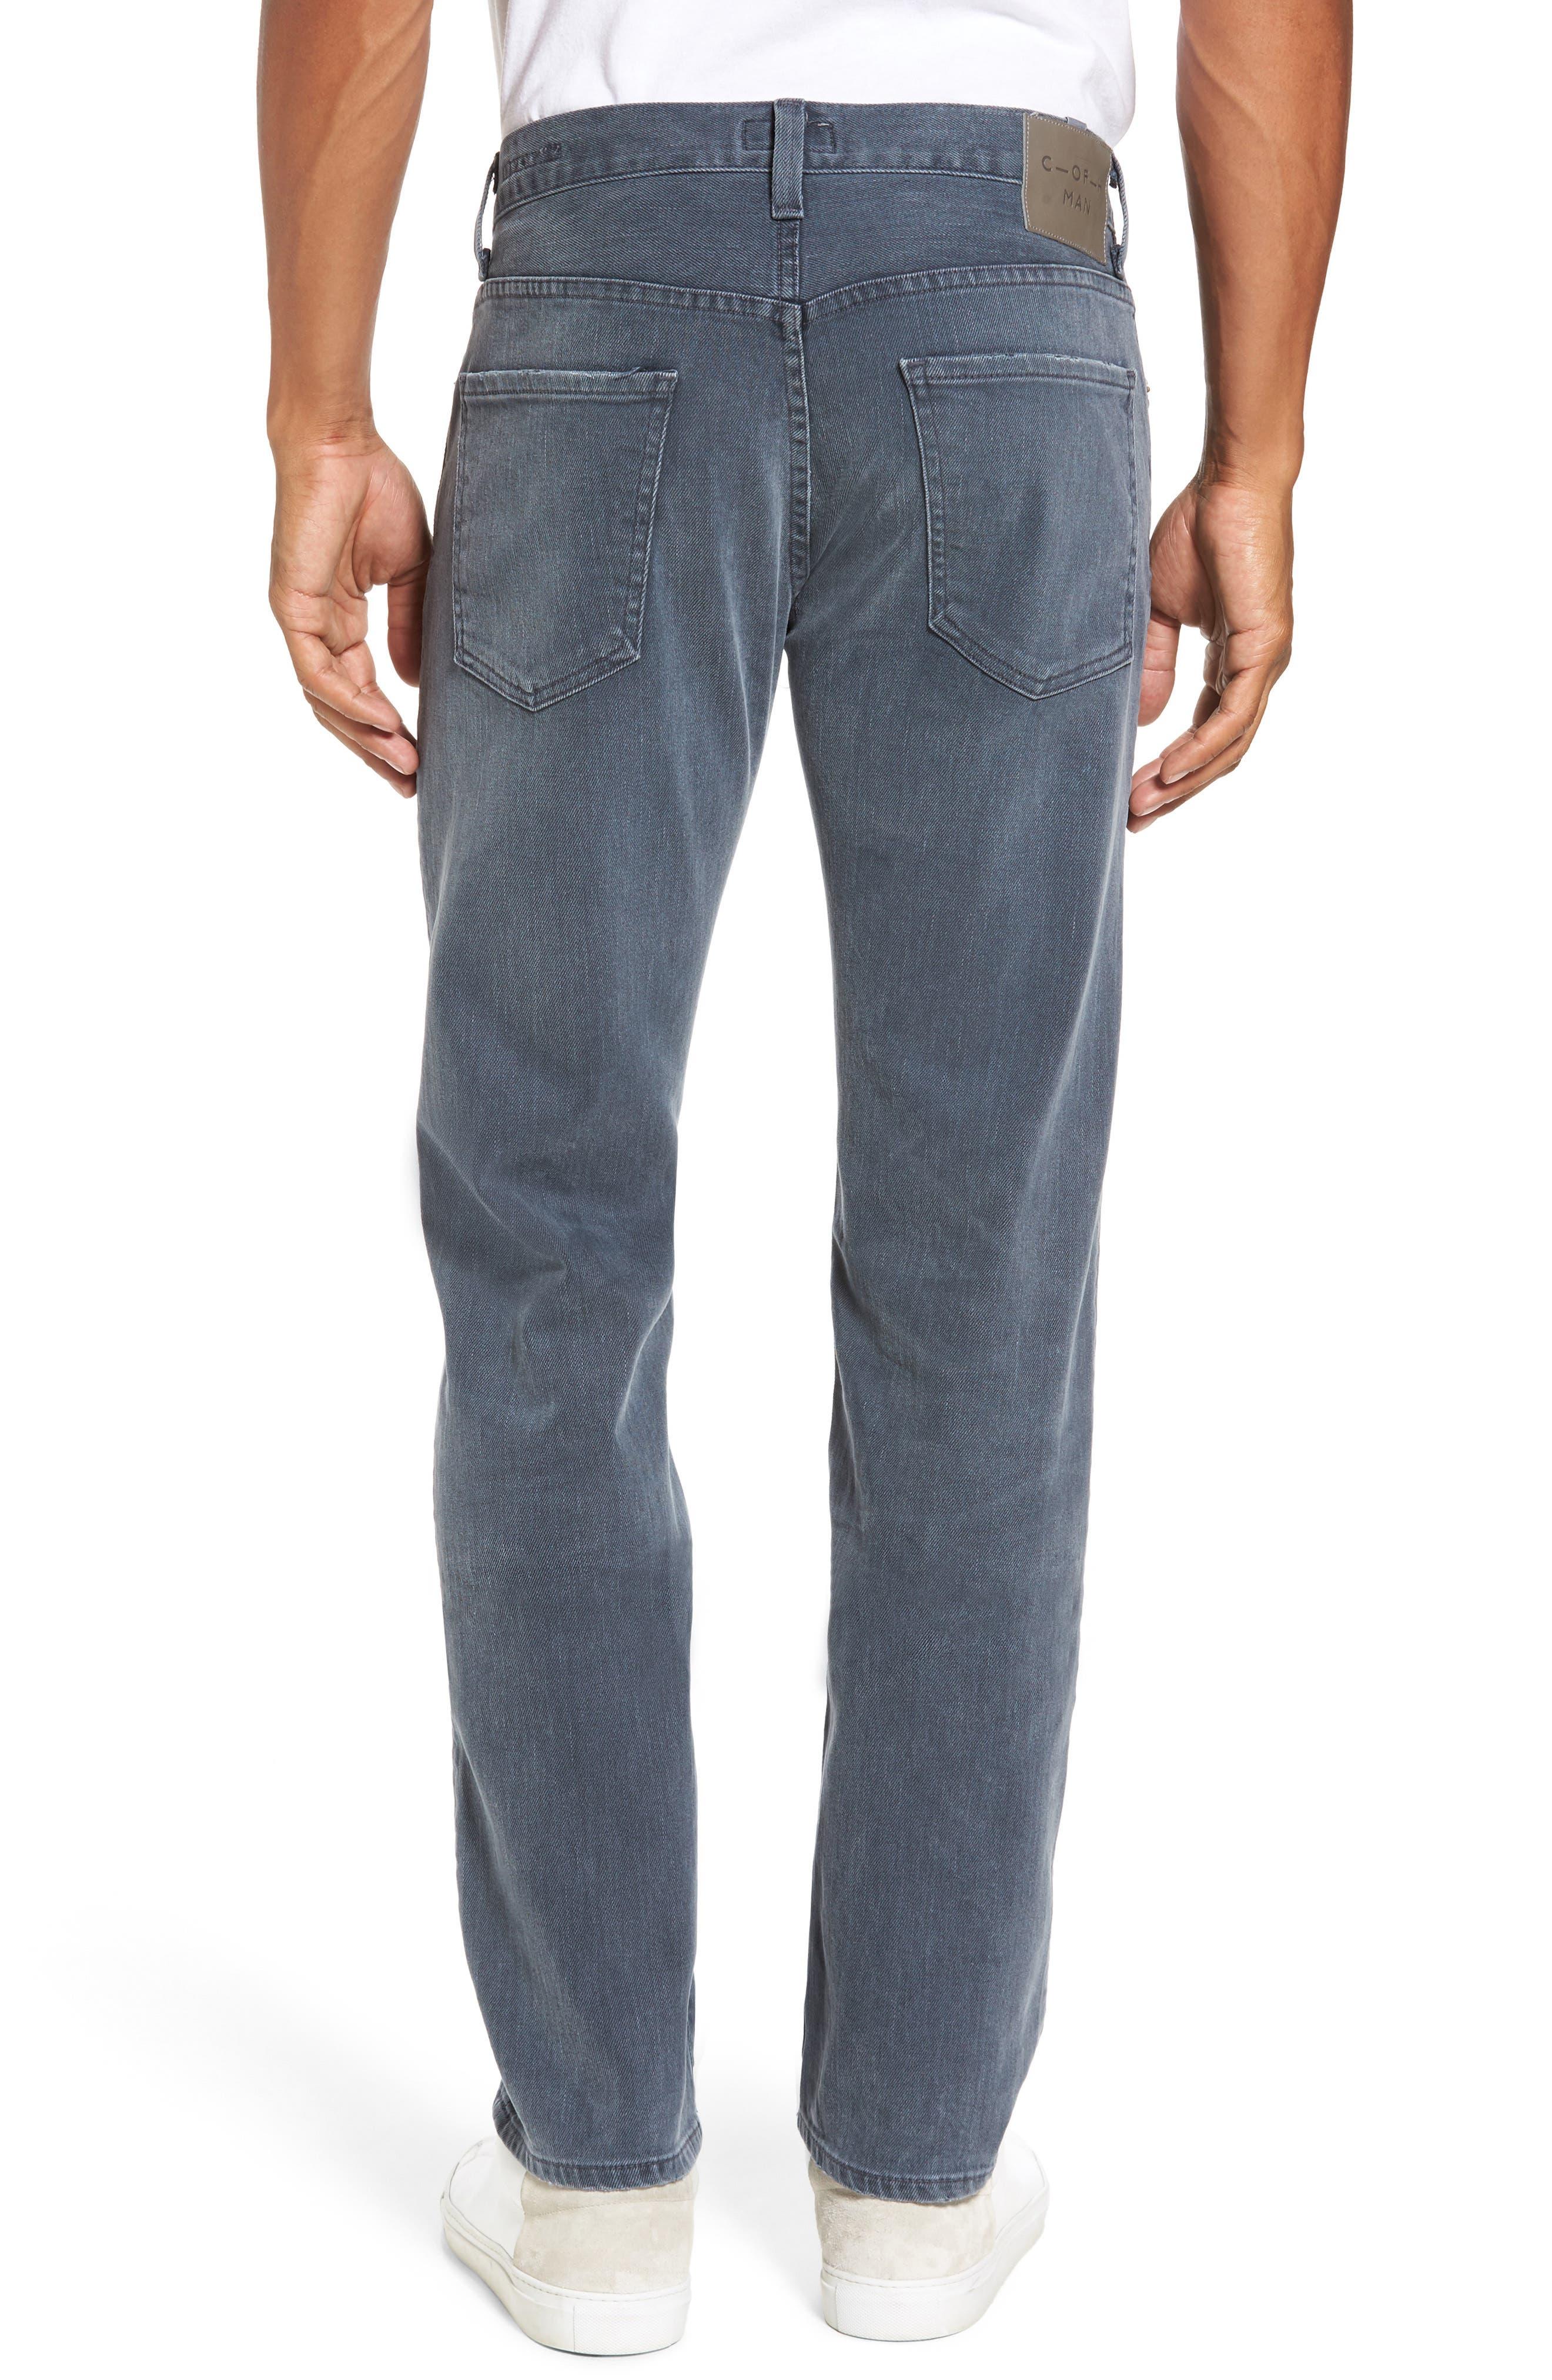 Core Slim Fit Jeans,                             Alternate thumbnail 2, color,                             GREY SKIES